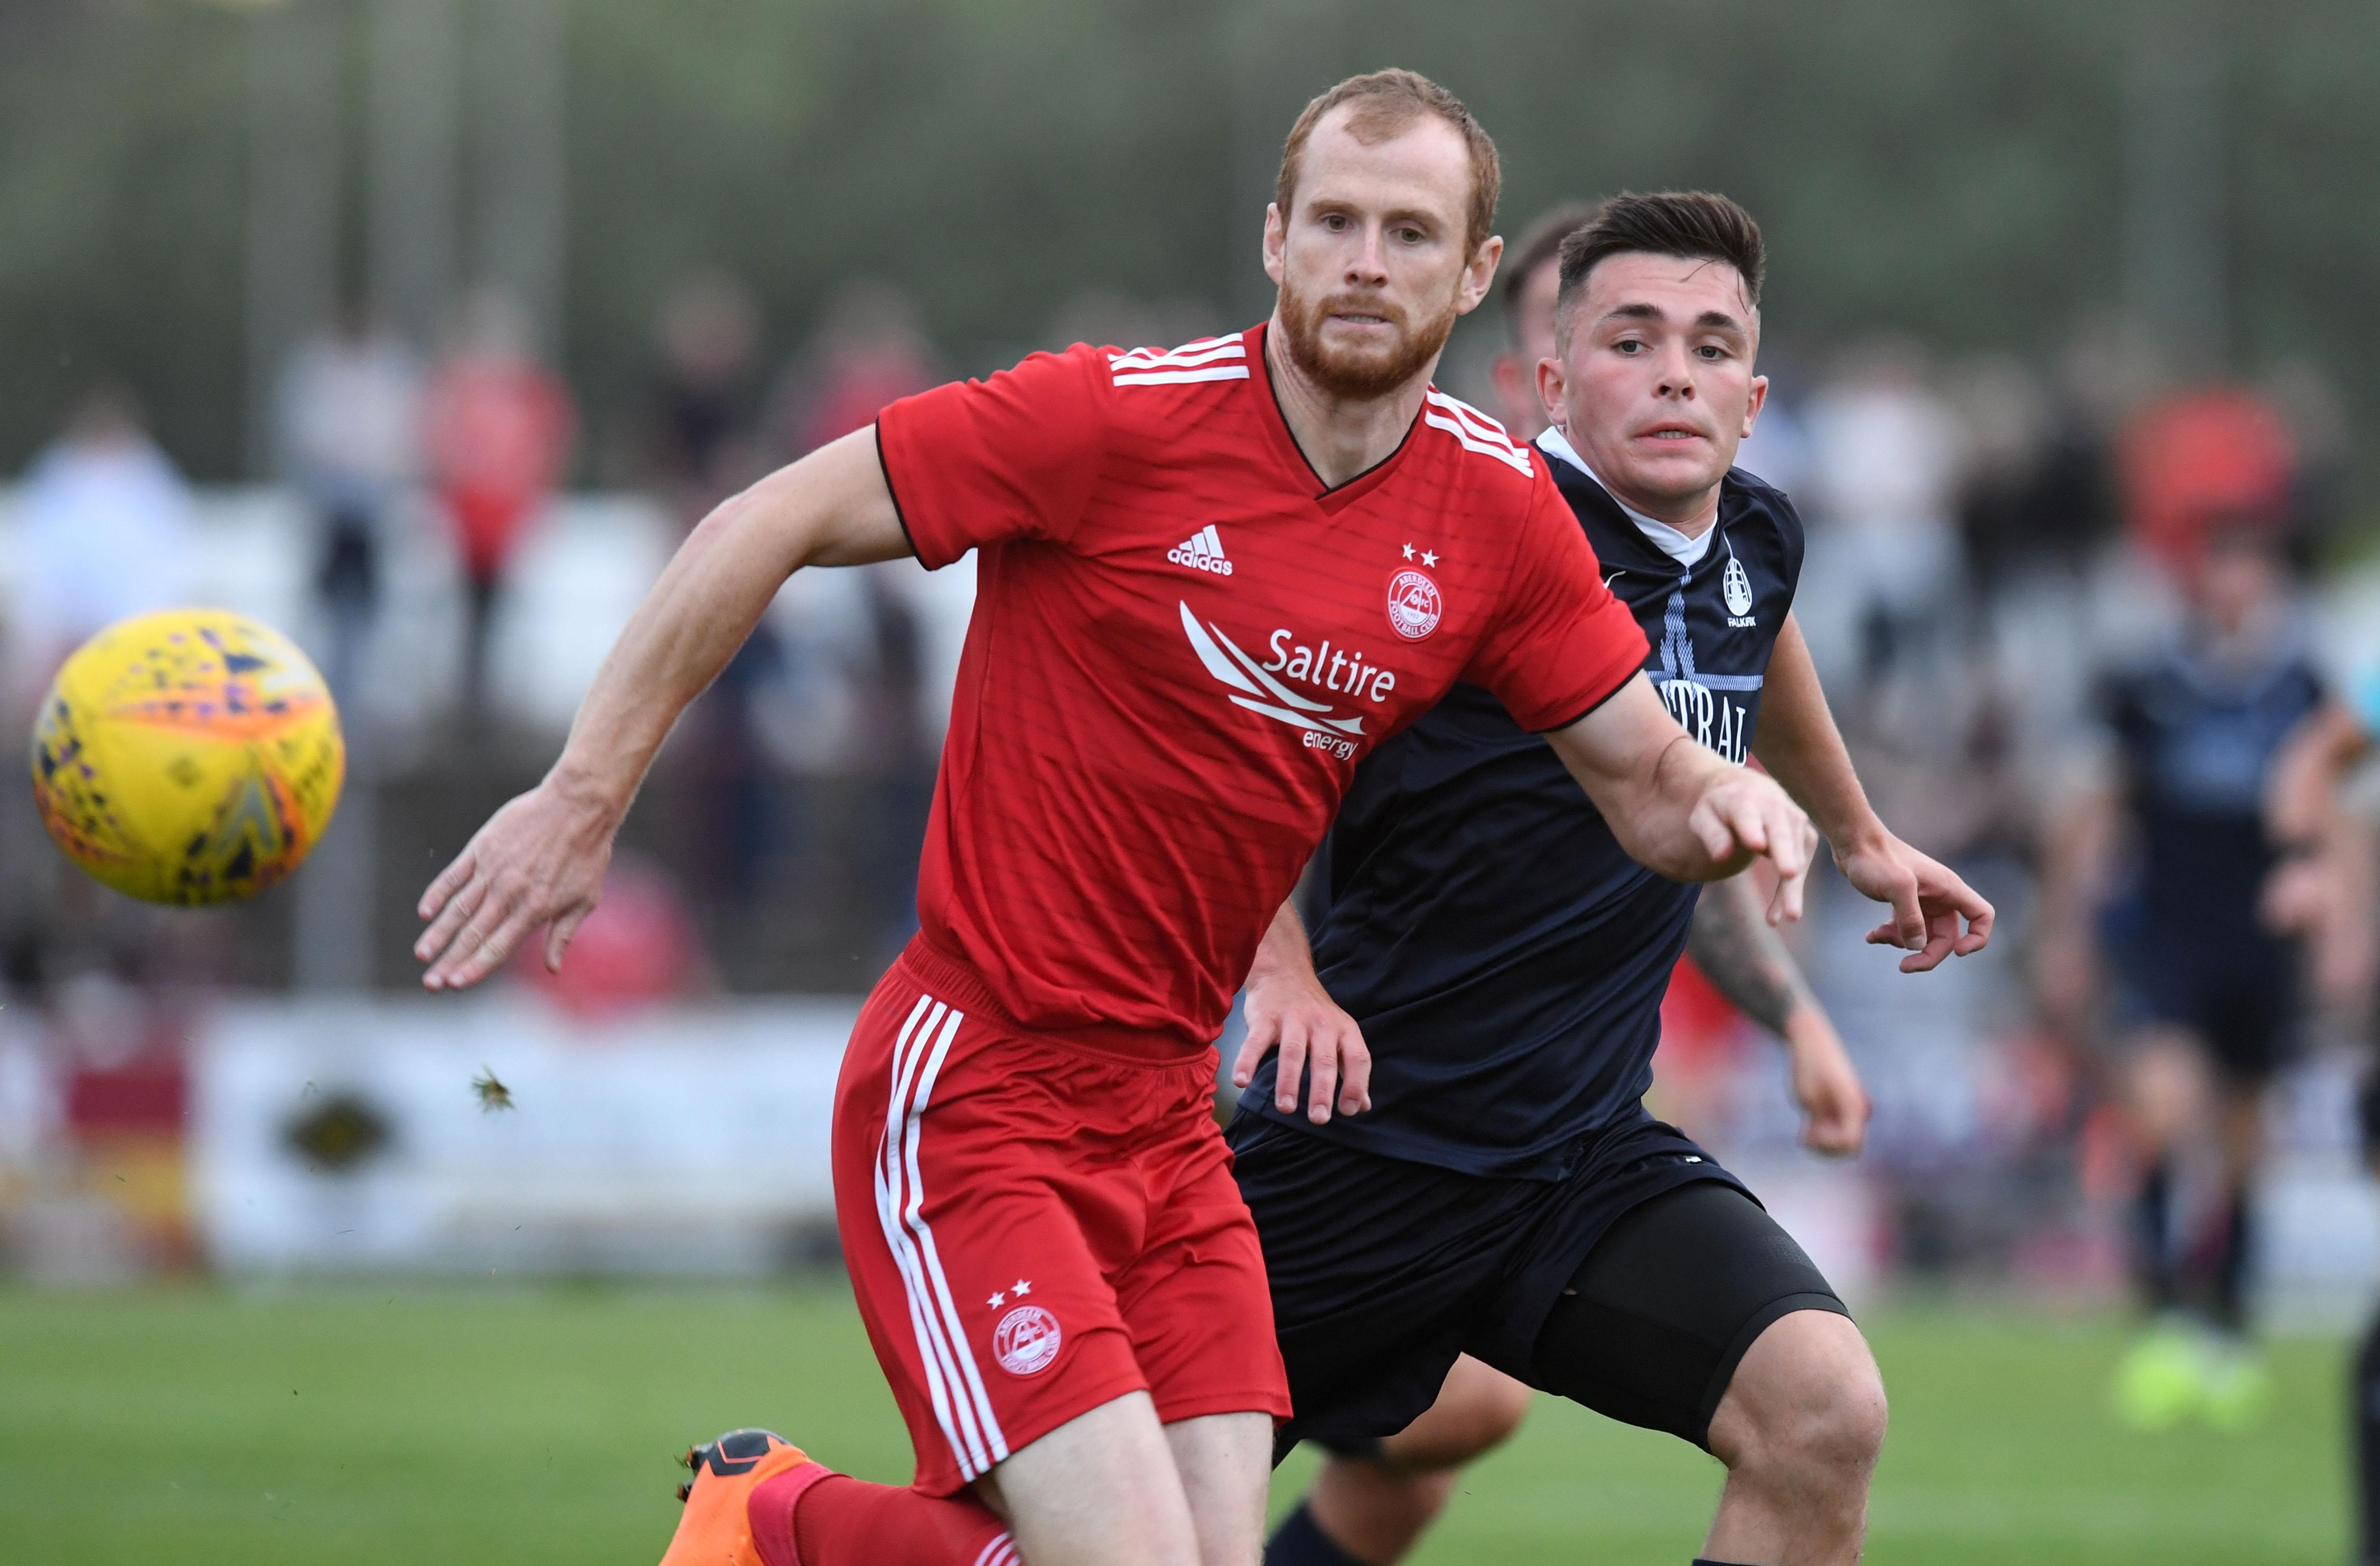 Aberdeen's Mark Reynolds and Falkirk trialist Jordan Allan compete for the ball in pre-season.